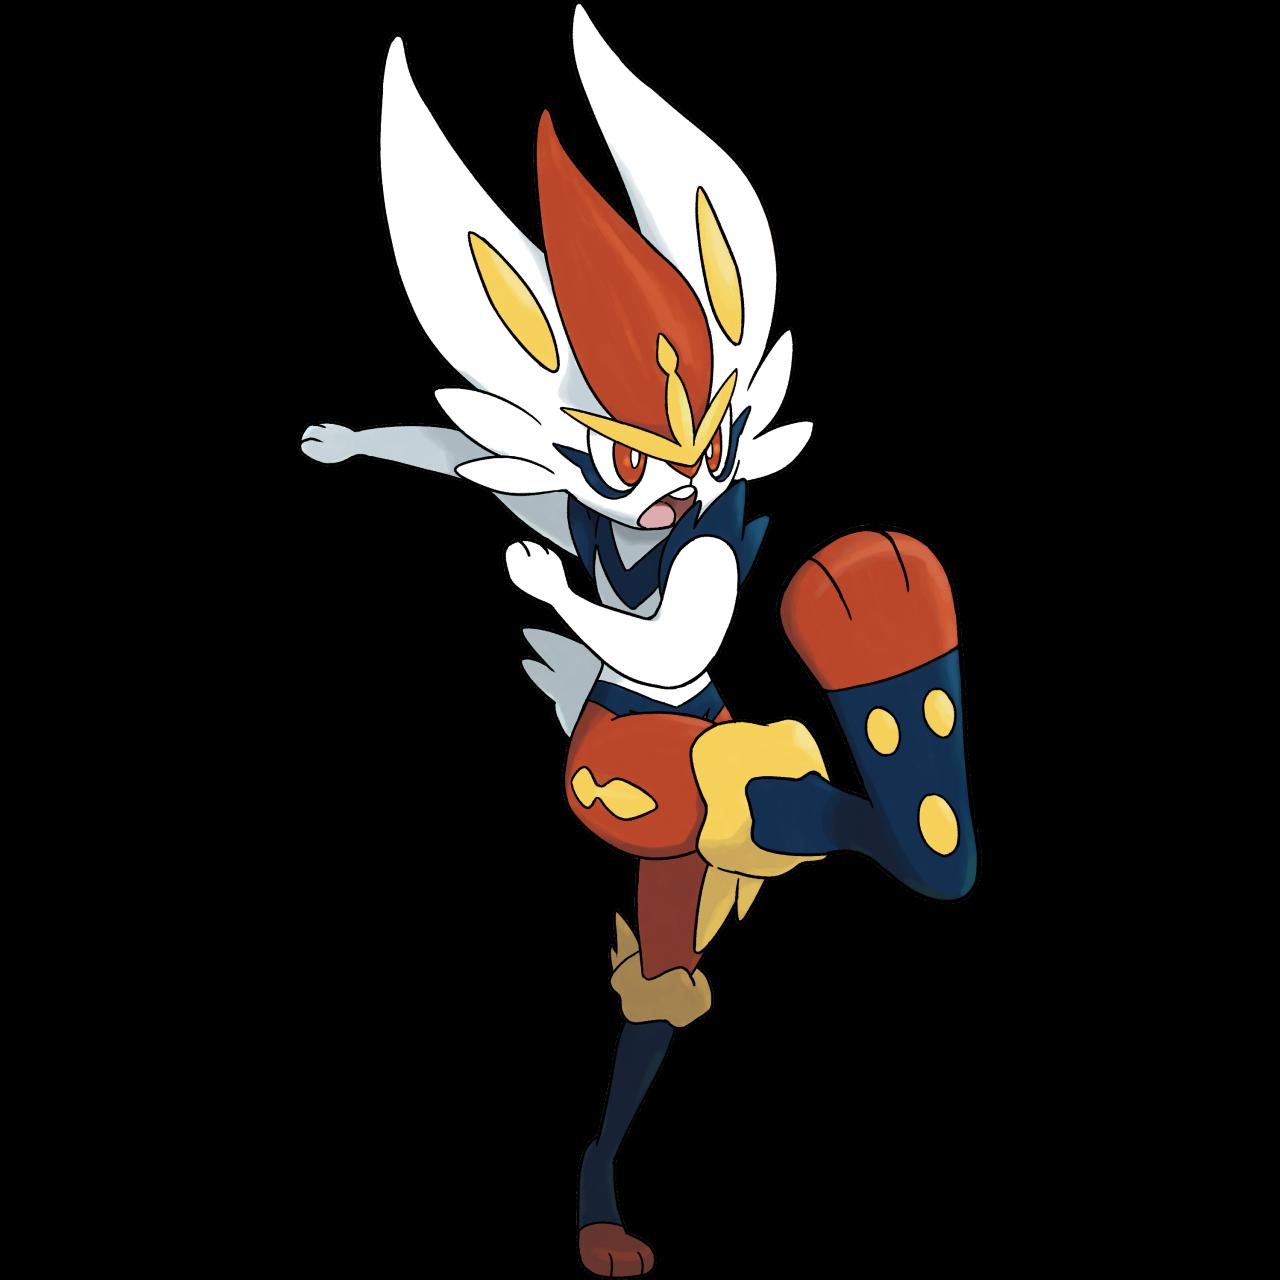 Cinderace (Pokémon)